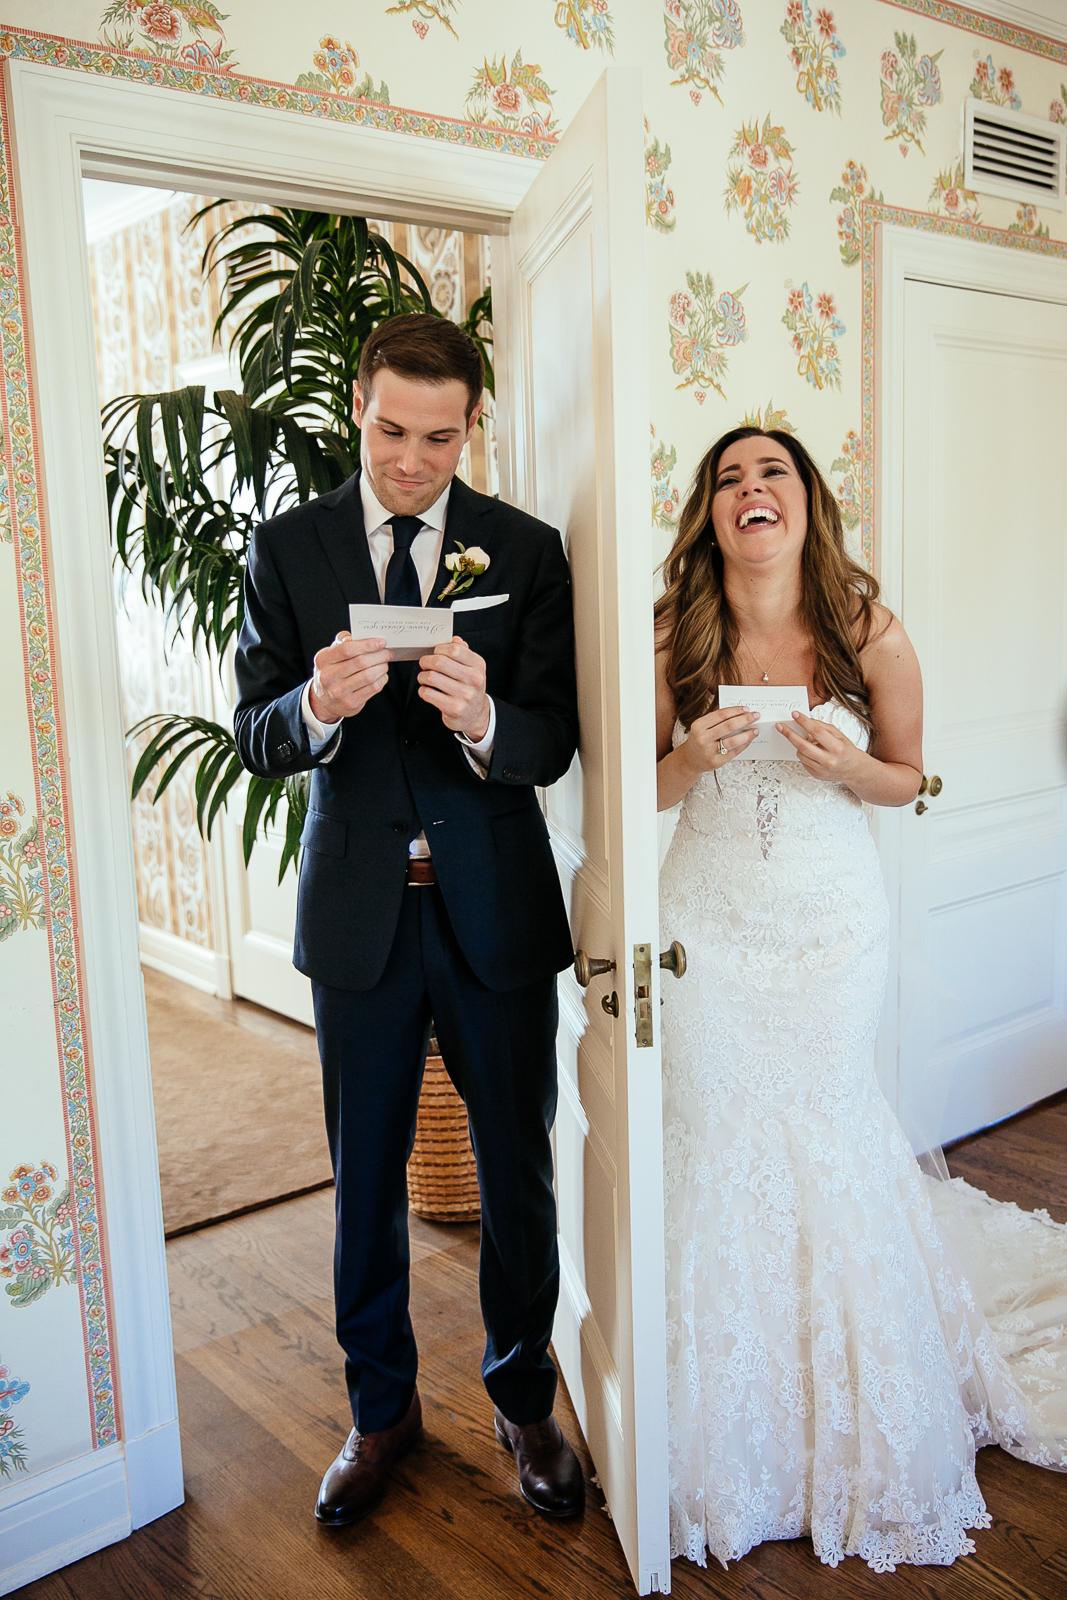 Amanda_&_Steve_Wedding_Darlington_House_La_Jolla_2015_1M2A1899.JPG